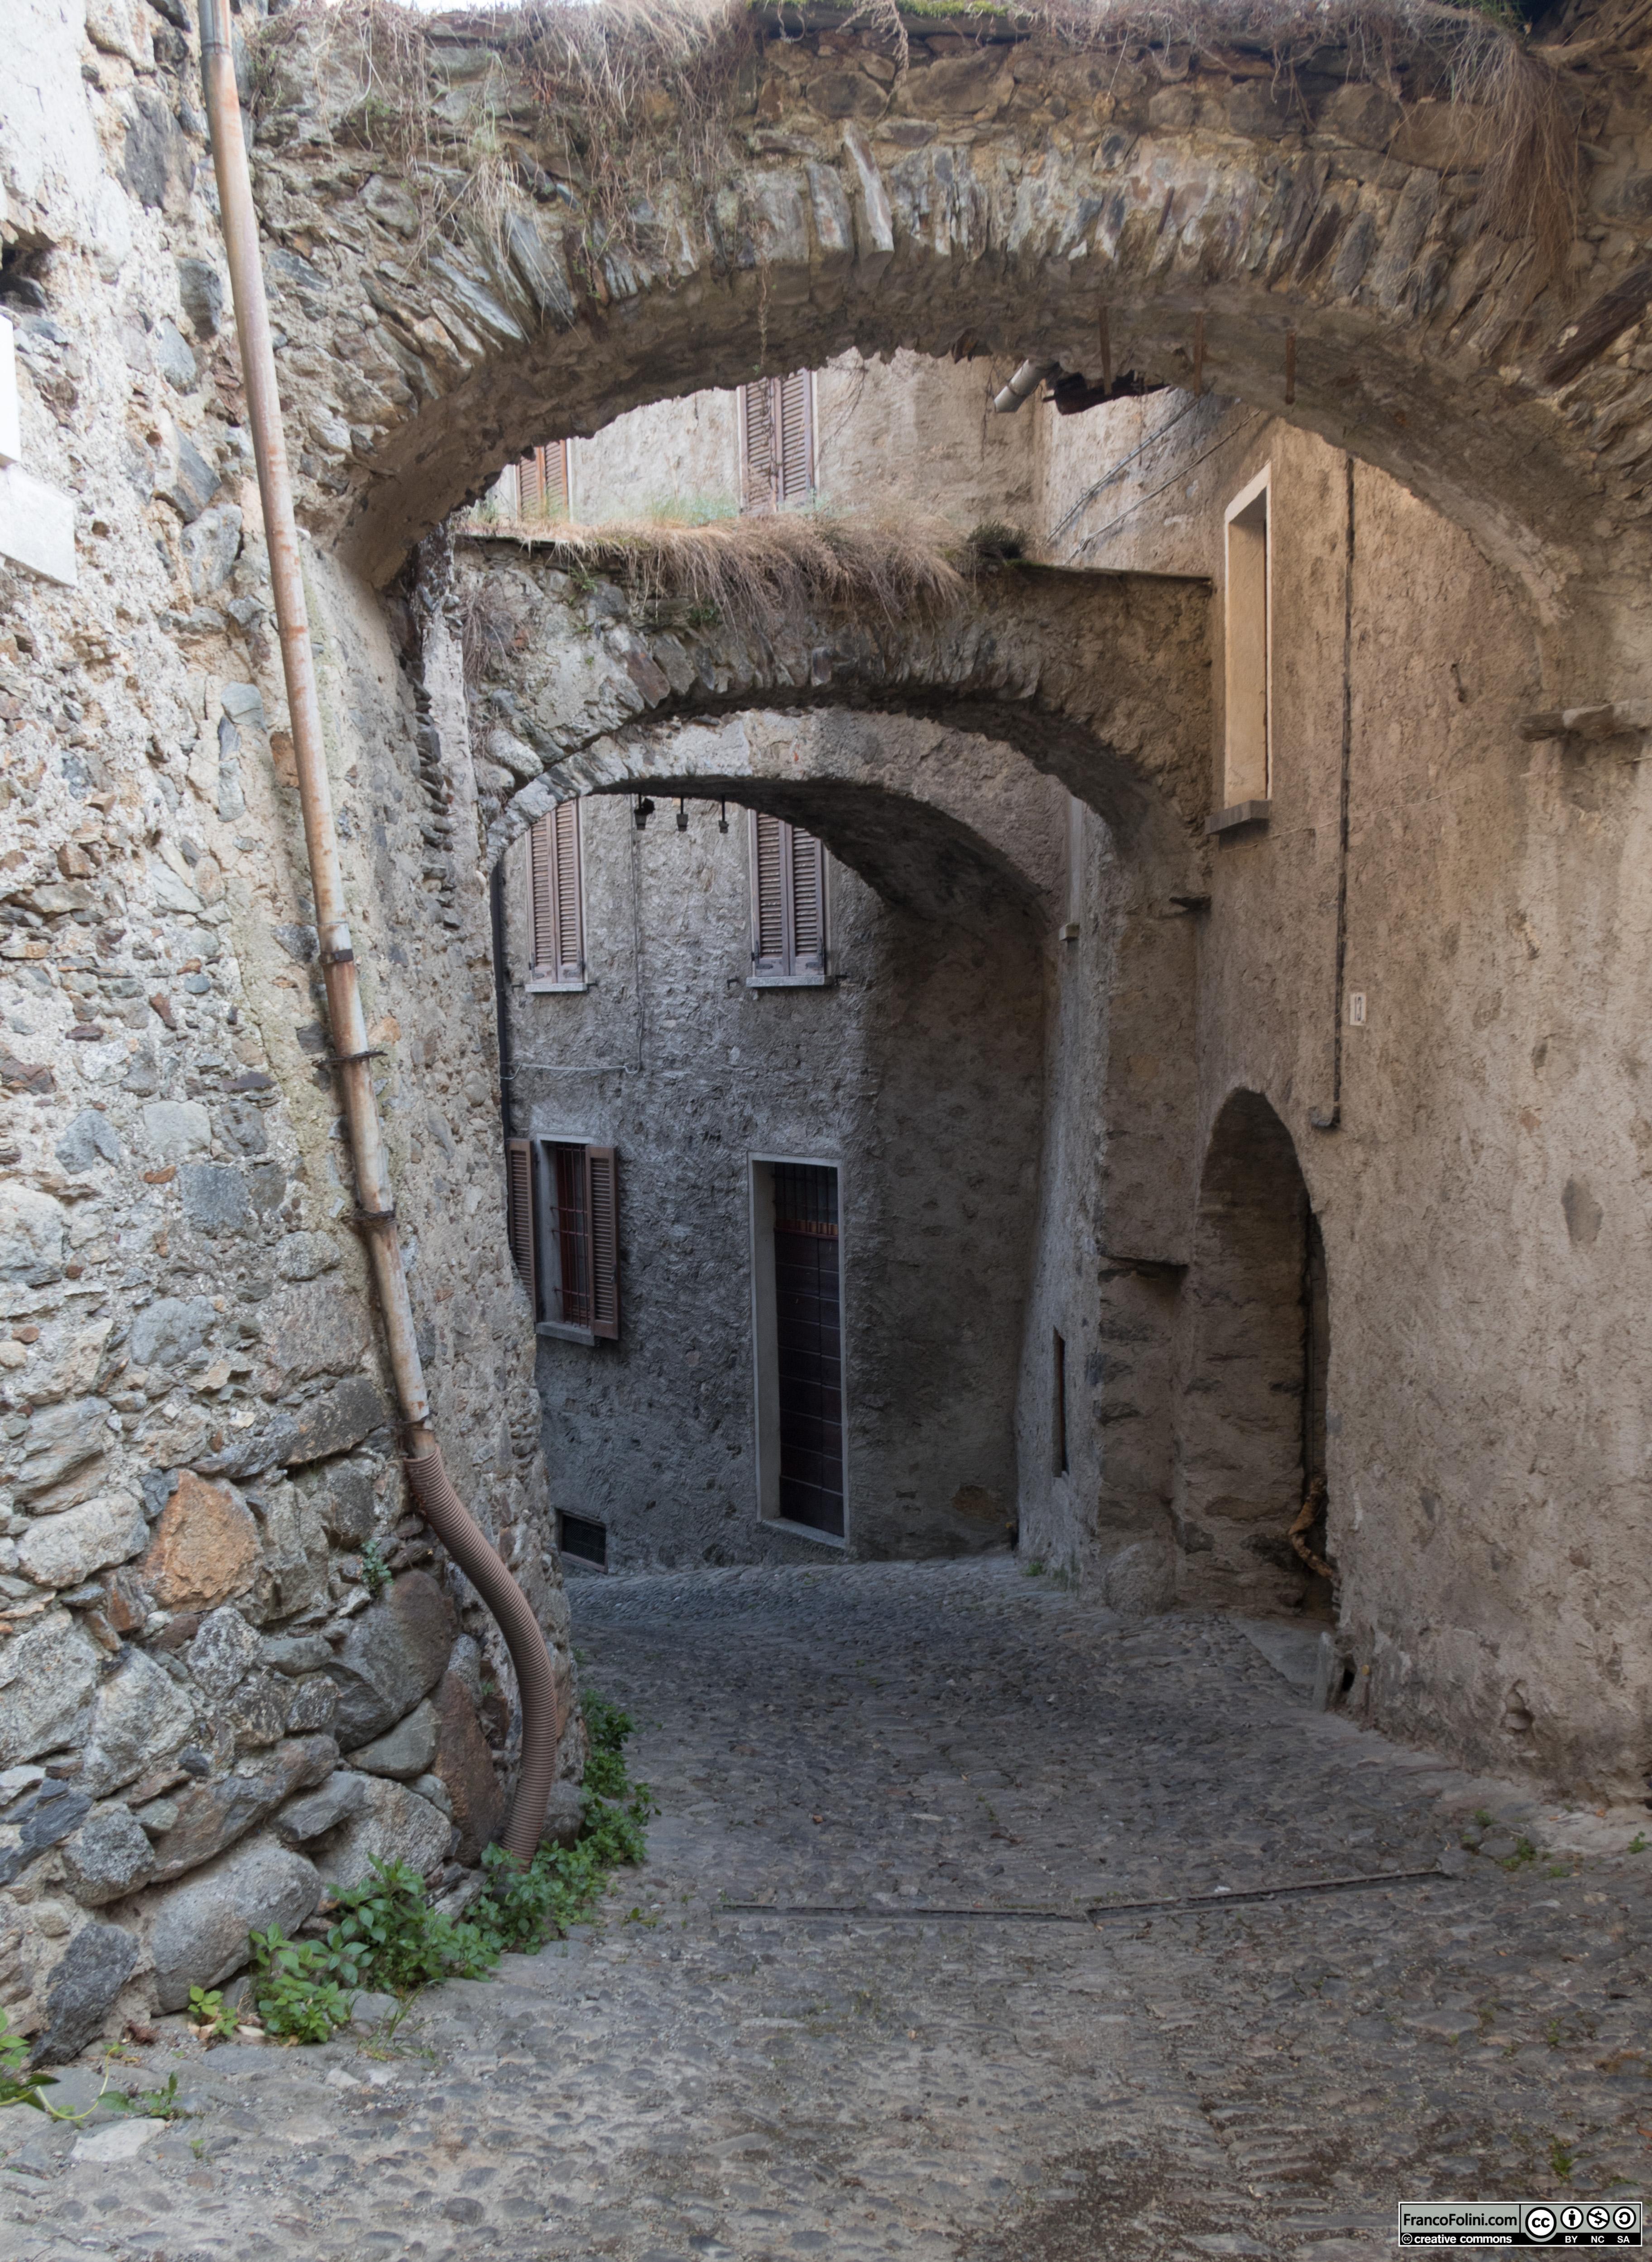 Incrocio tra via Pozzalio e via Paradiso, Ponte in Valtellina